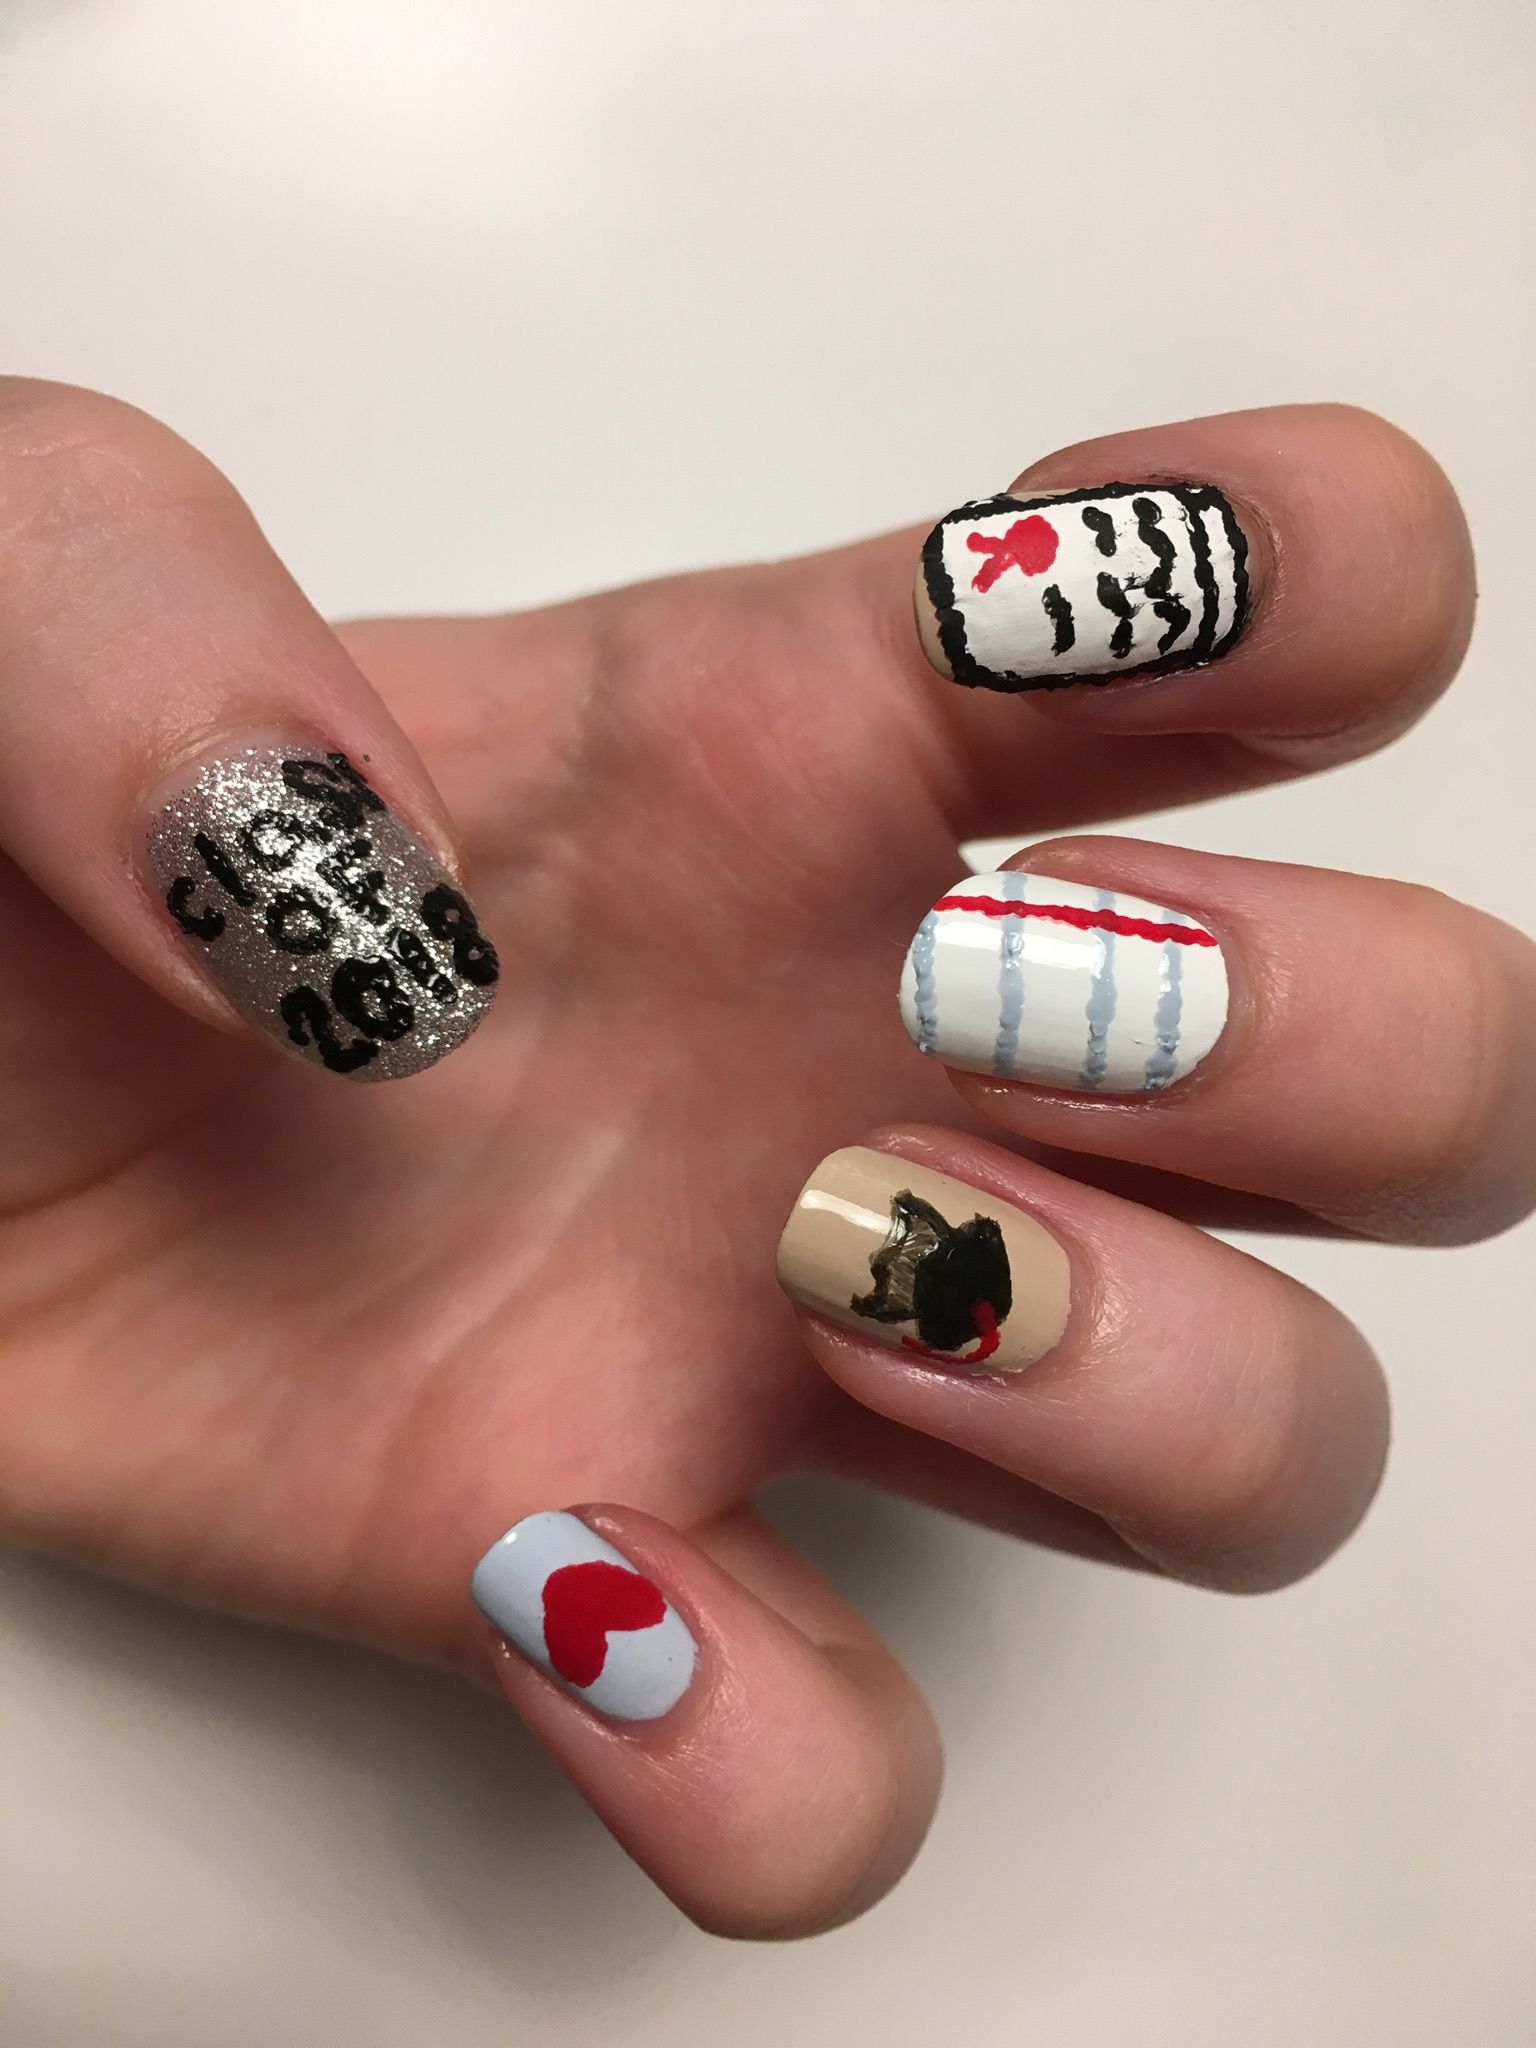 48 Awesome Gel Nail Art Designs Trend In 2019 | Gel nail